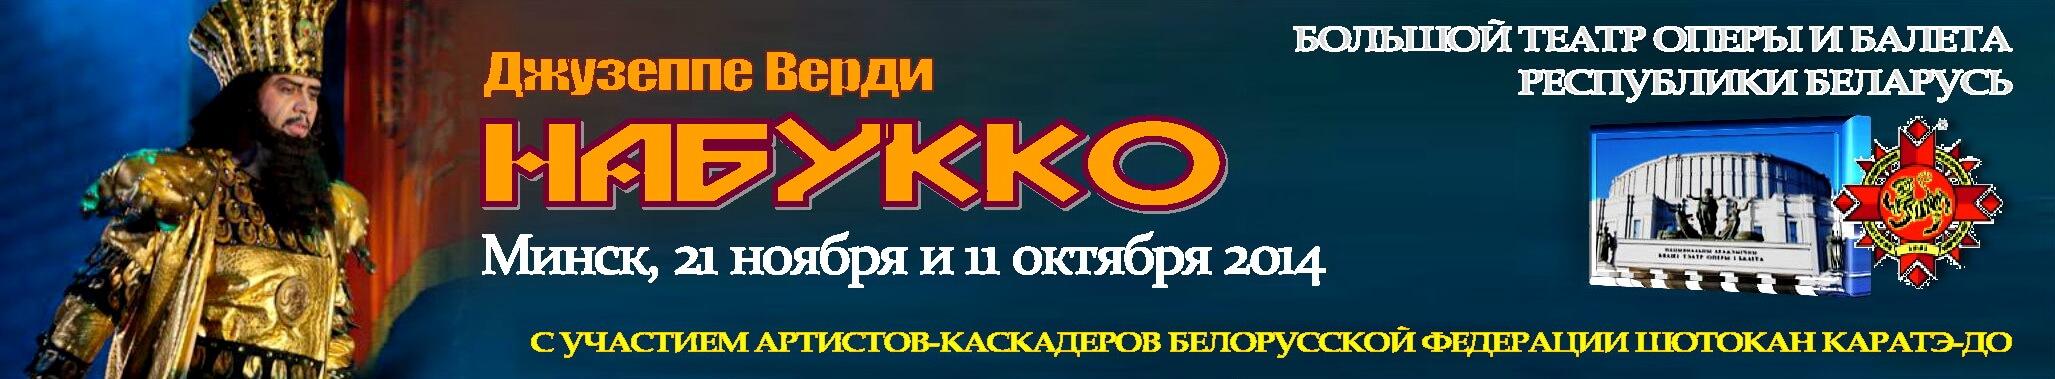 Набукко 2014-09 2014-11 Баннер